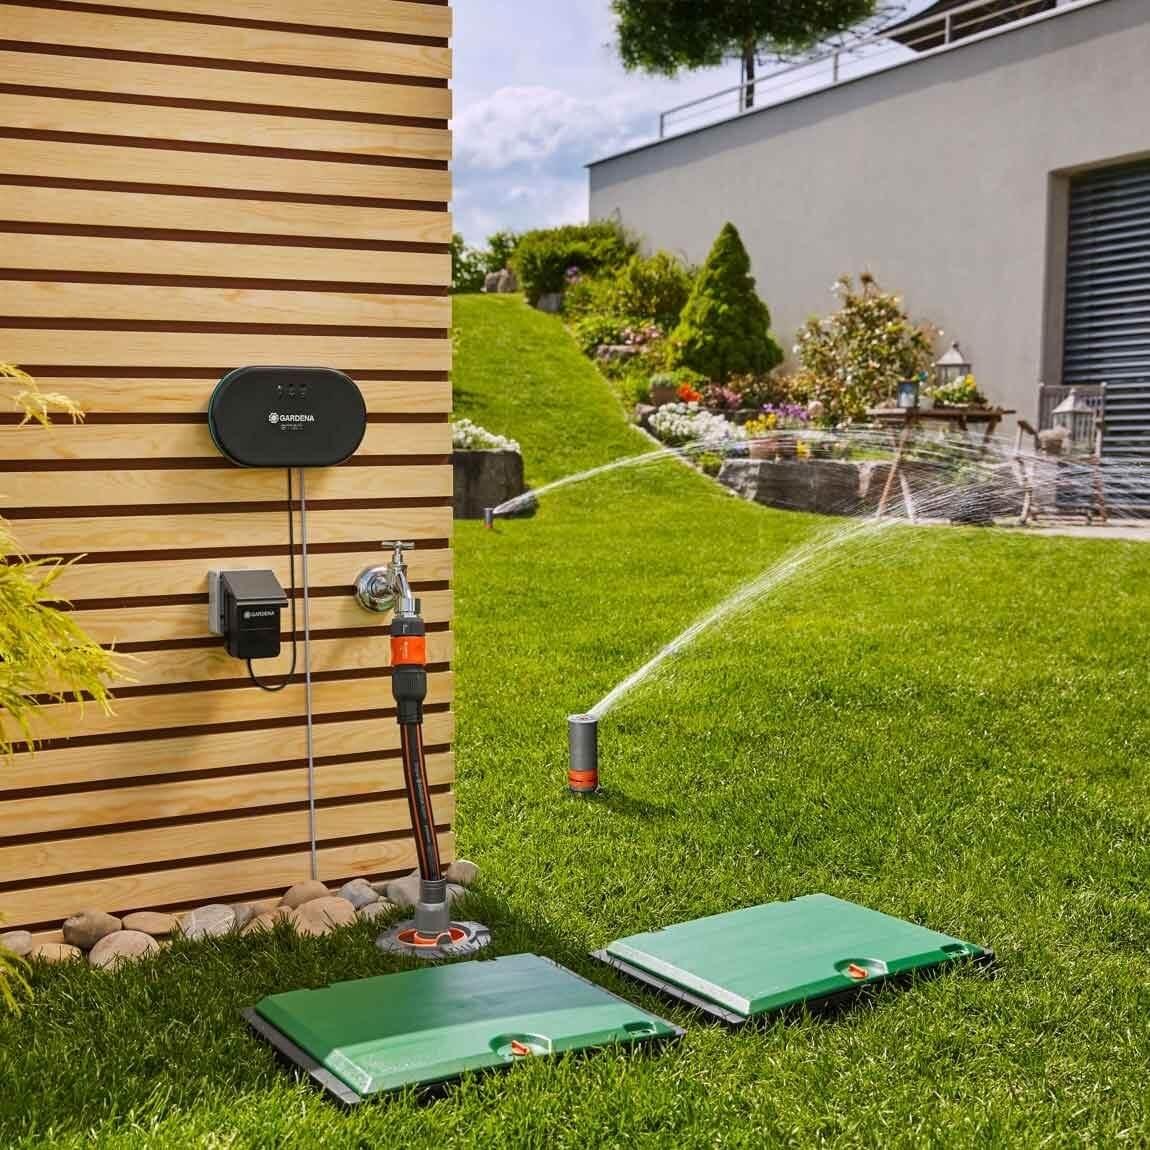 GARDENA Smart Irrigation Control